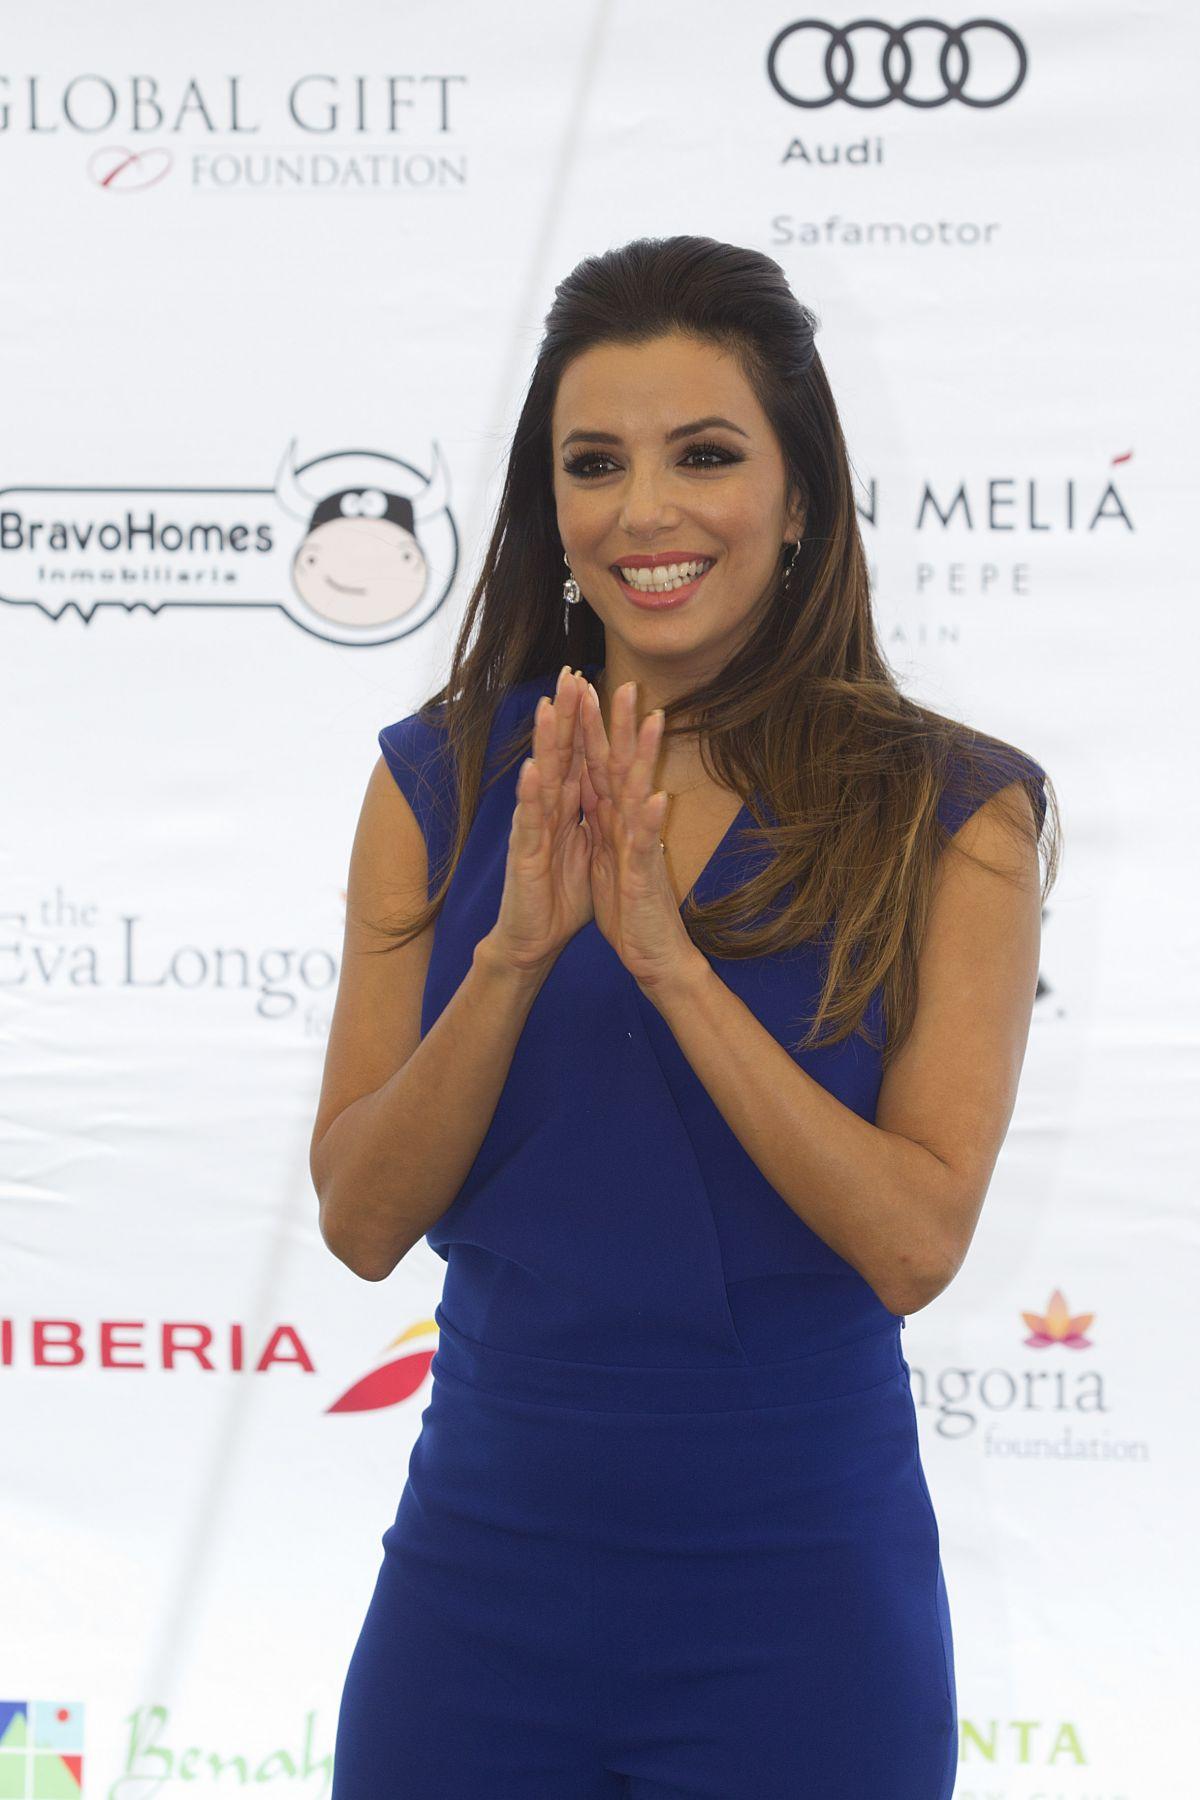 EVA LONGORIA at Global Gift Celebrity Golf Tournament in Spain